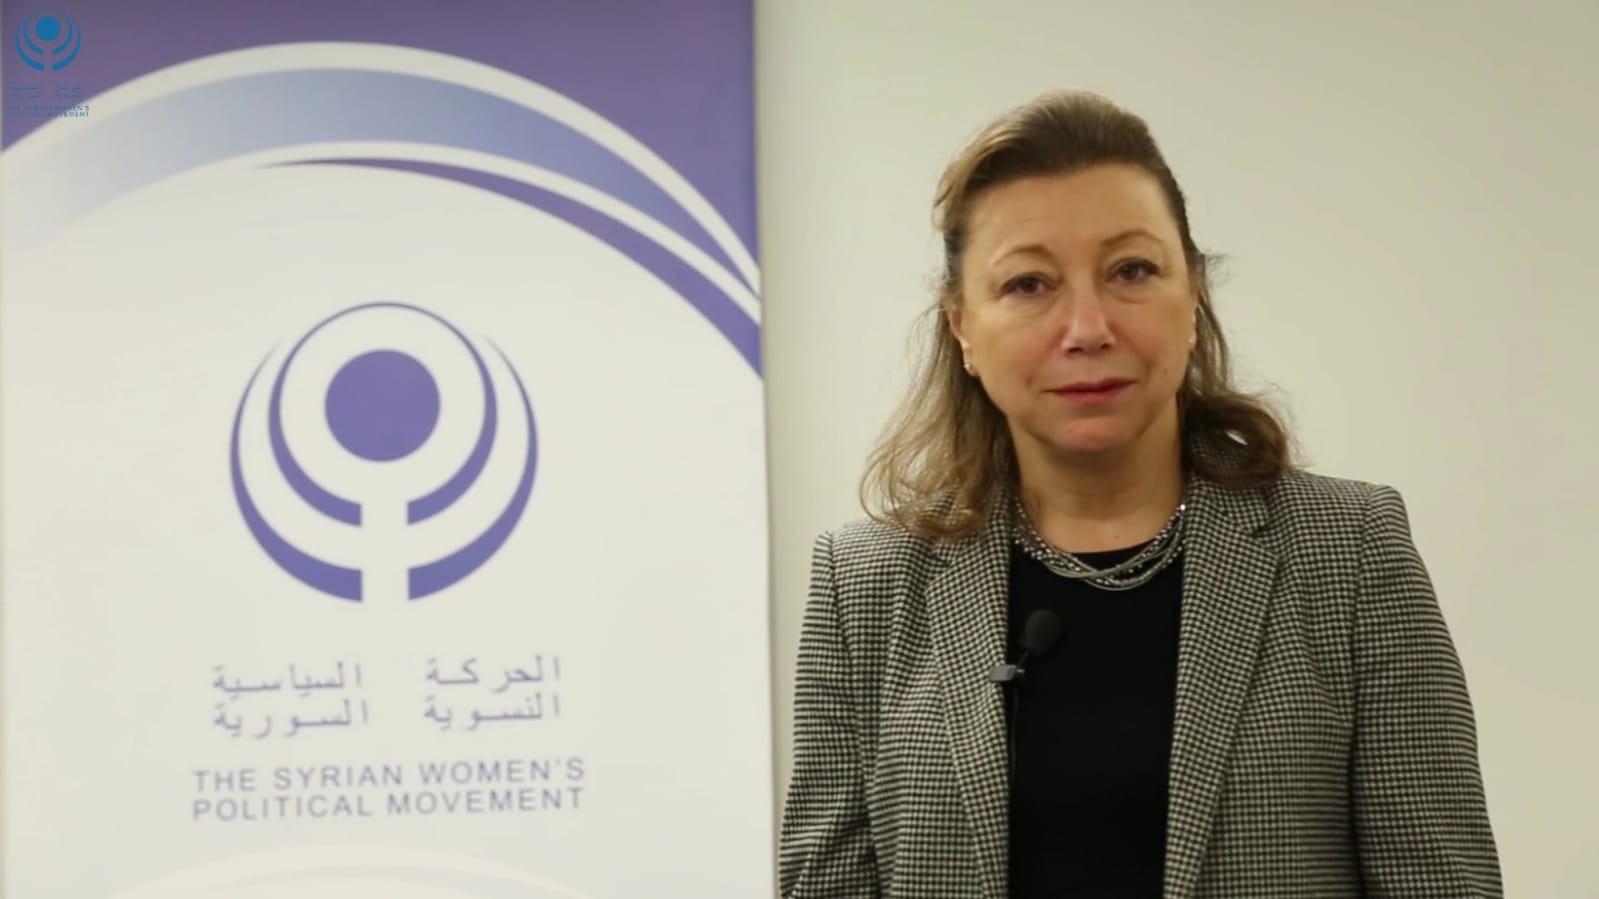 Bassma Kodmani The Syrian Women's Political Movement Member